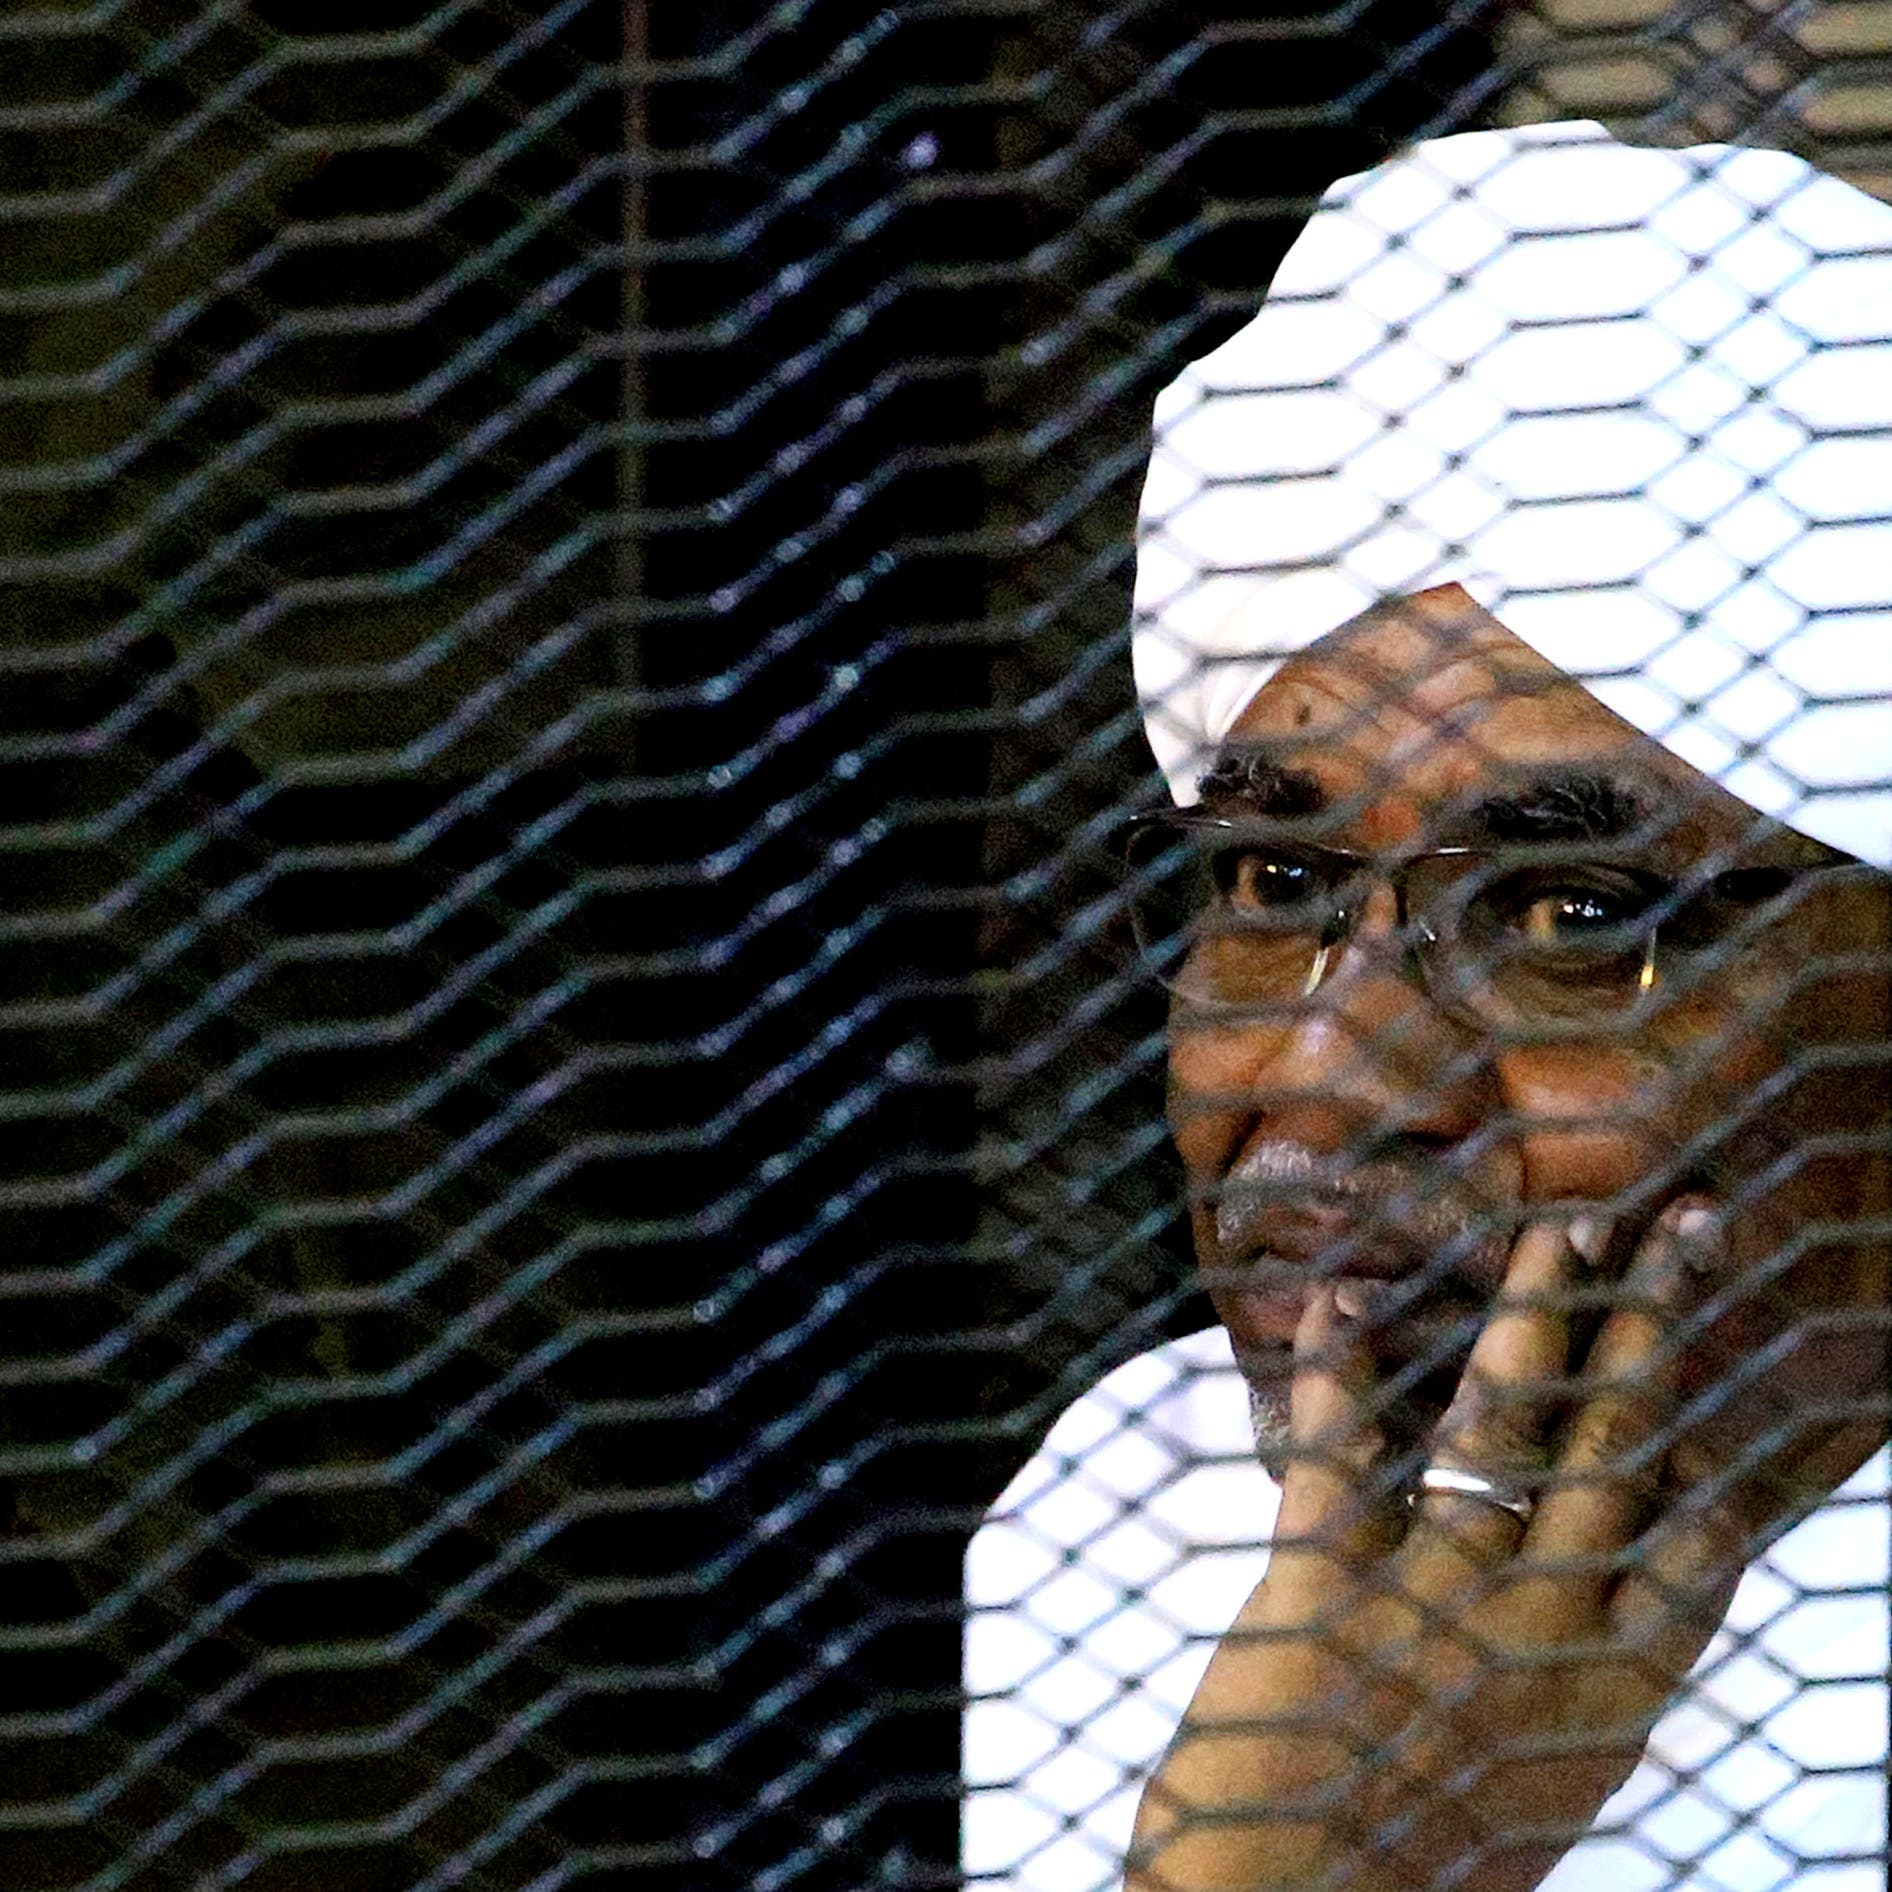 Sudan to hand former president Bashir to International Criminal Court: Minister